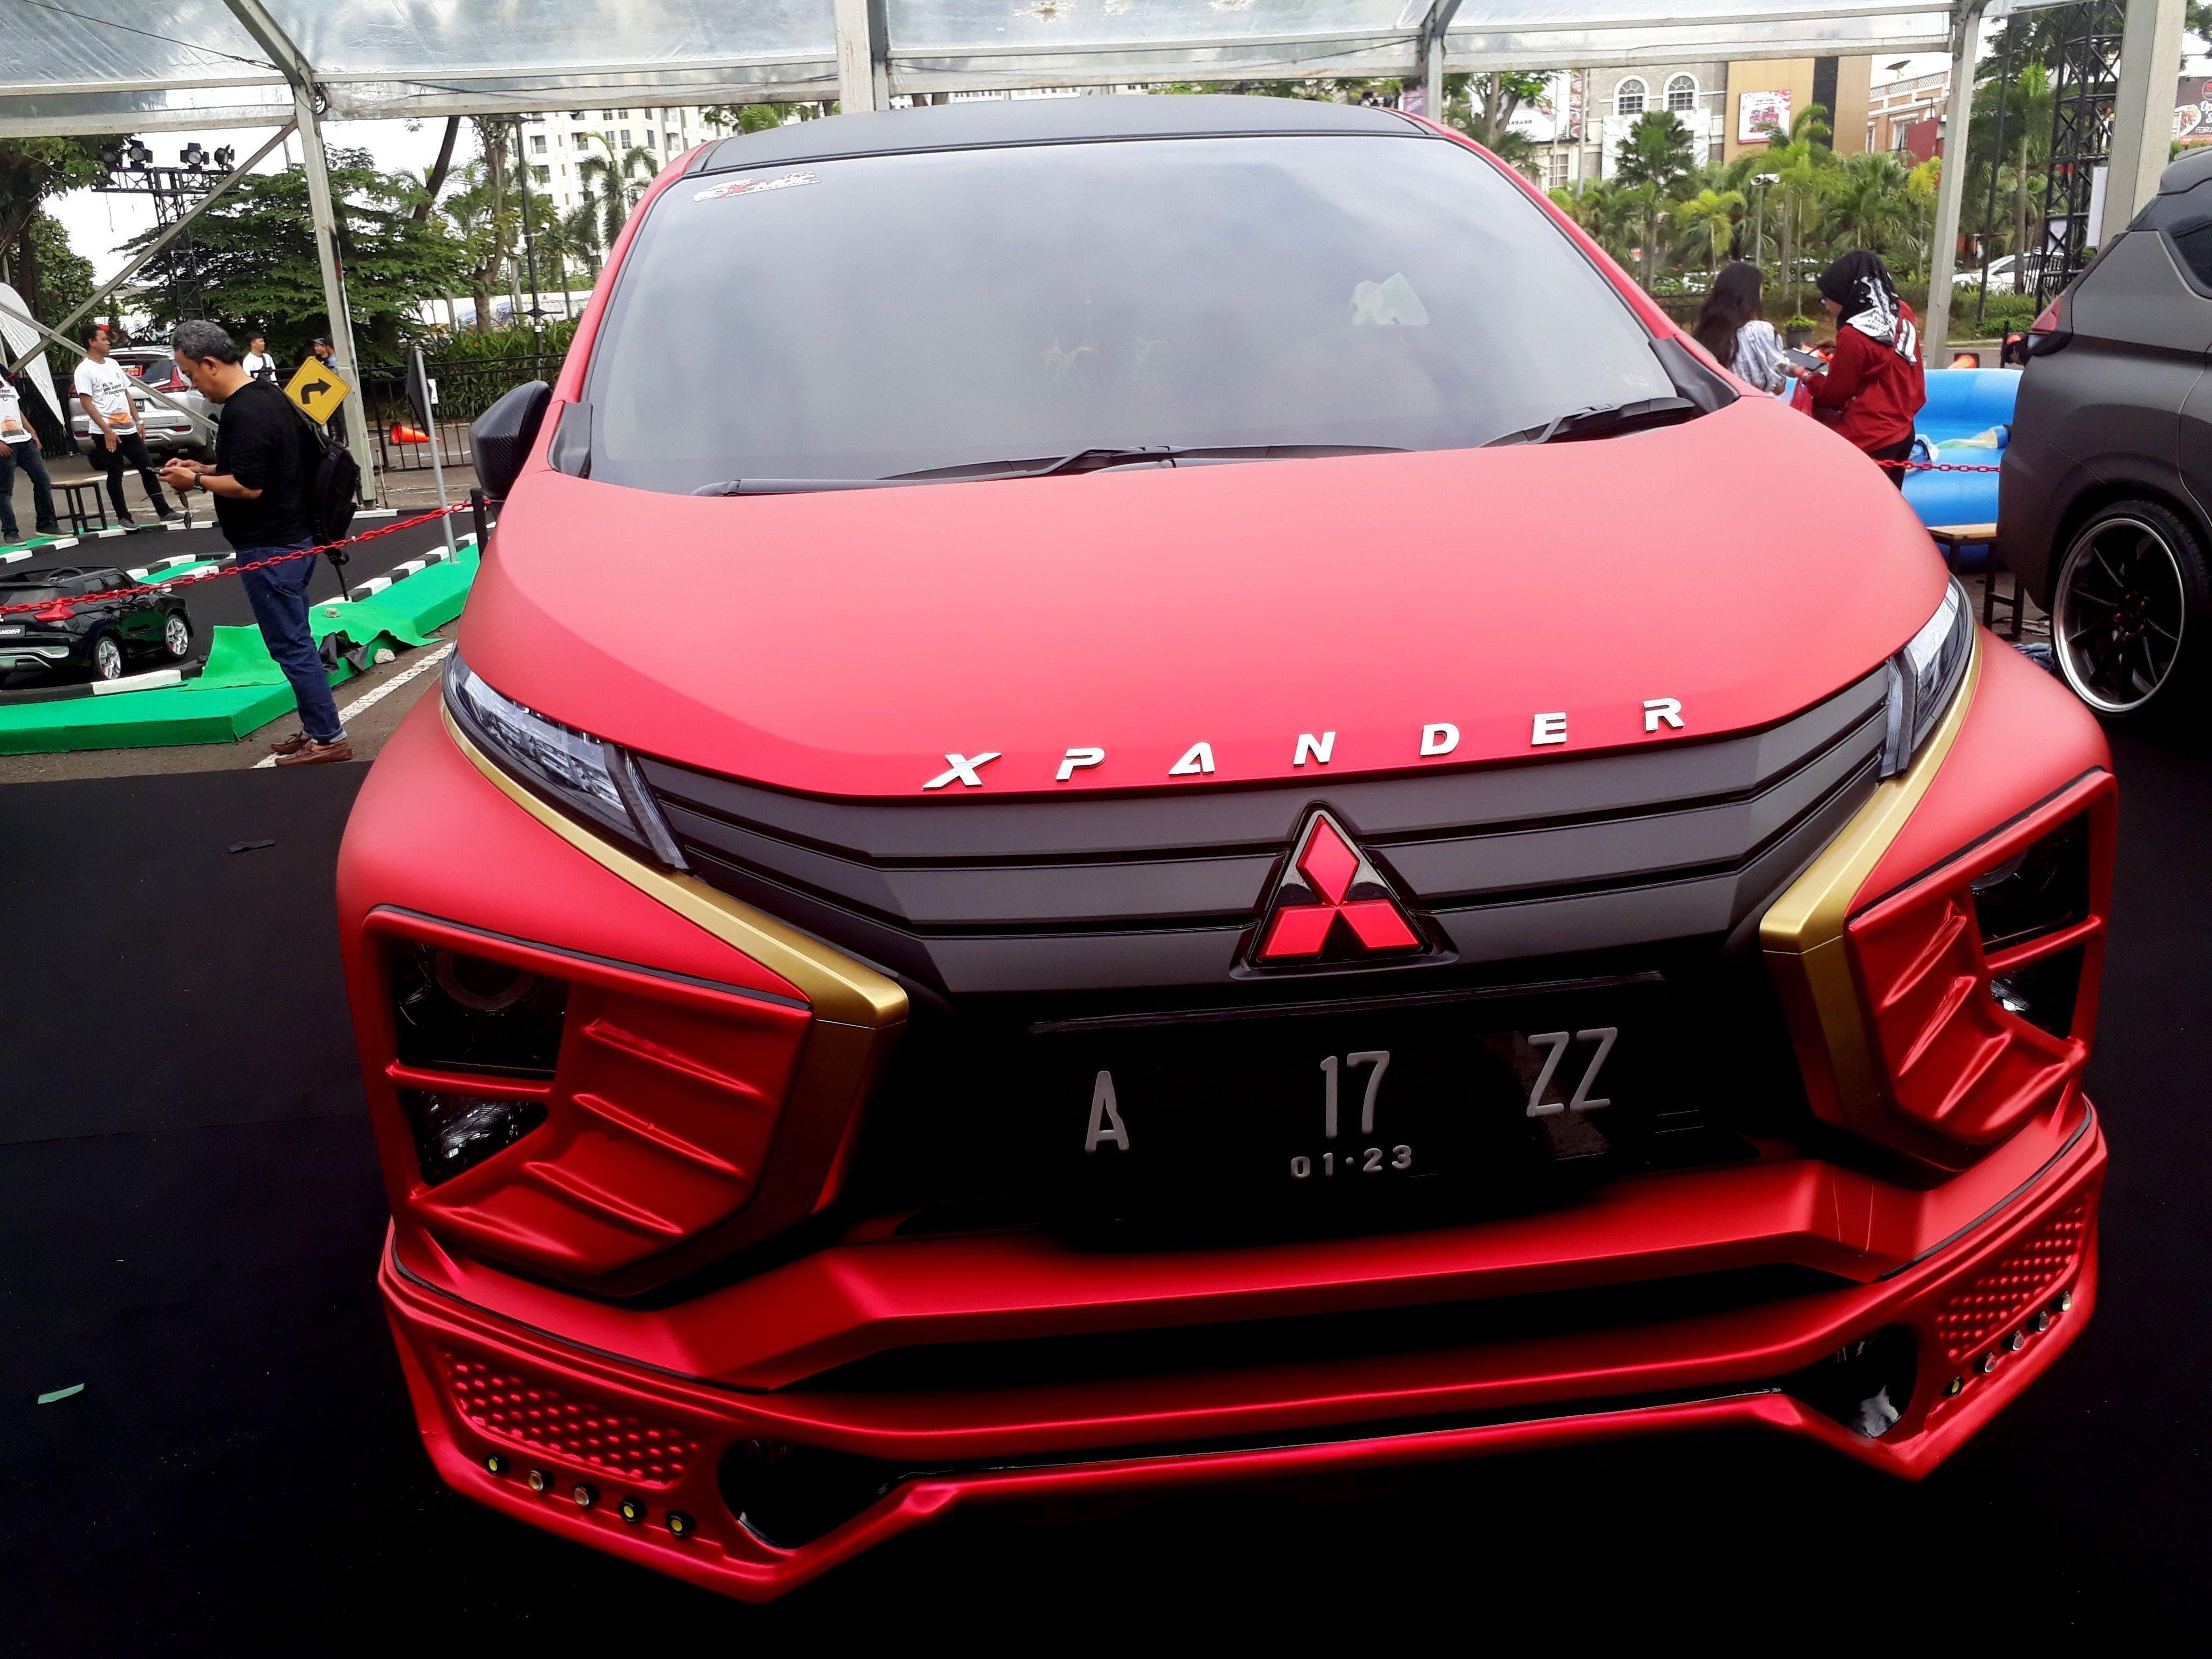 Suzuki Ertiga Modifikasi Mobil Mobil